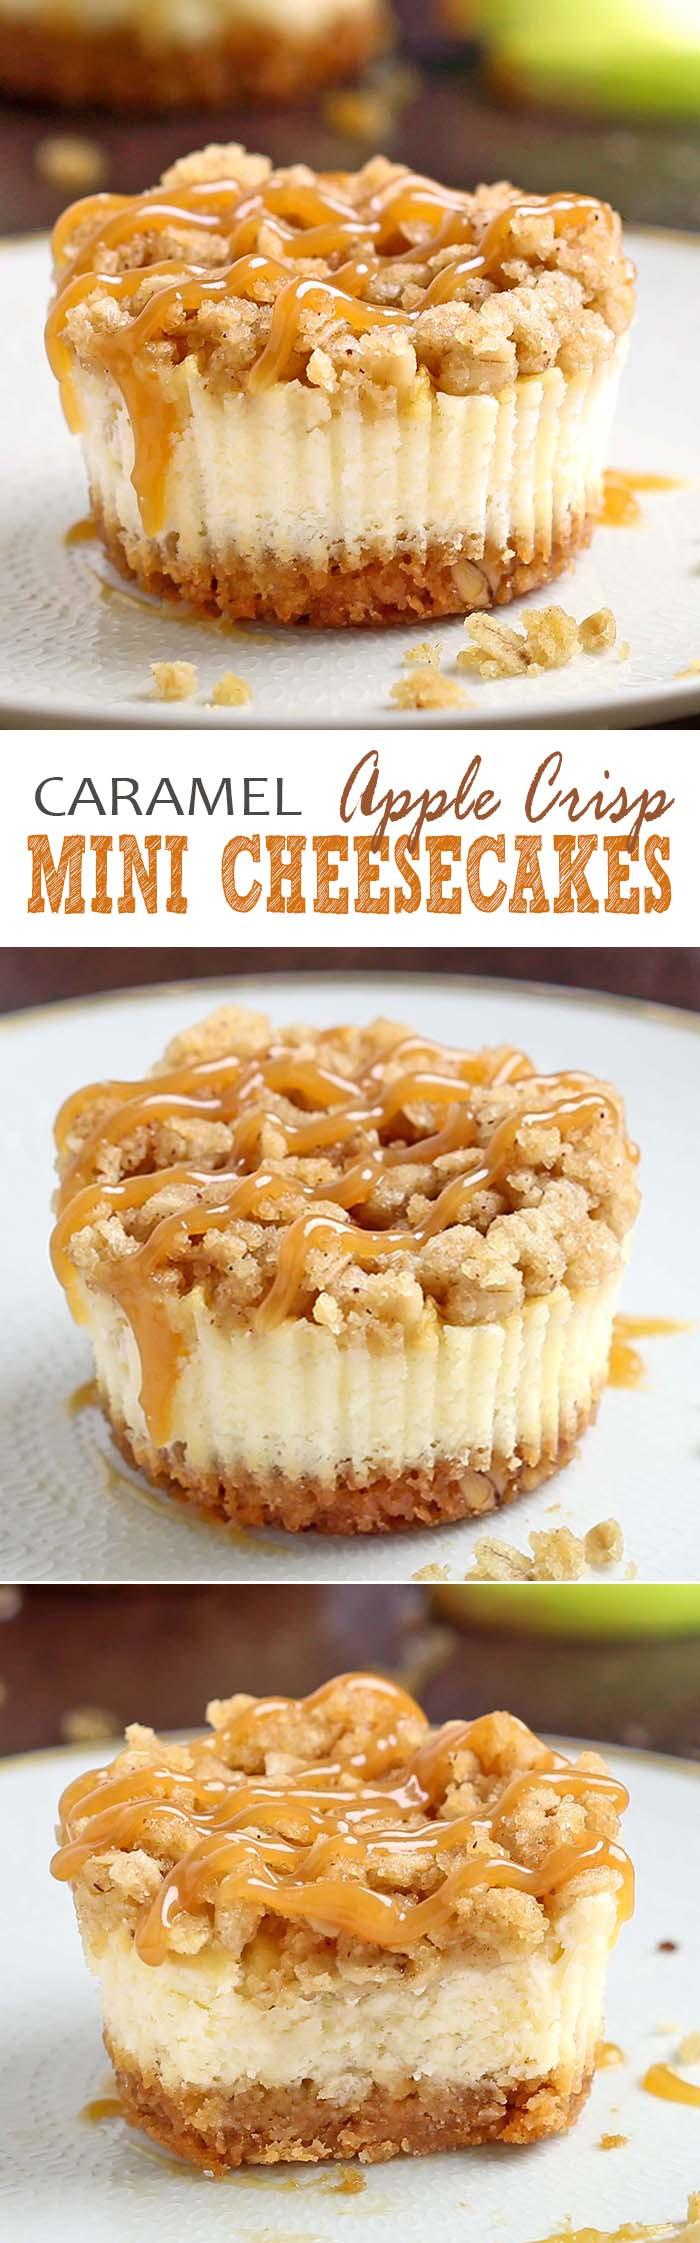 Apple Crisp Dessert  Caramel Apple Crisp Mini Cheesecakes Cakescottage